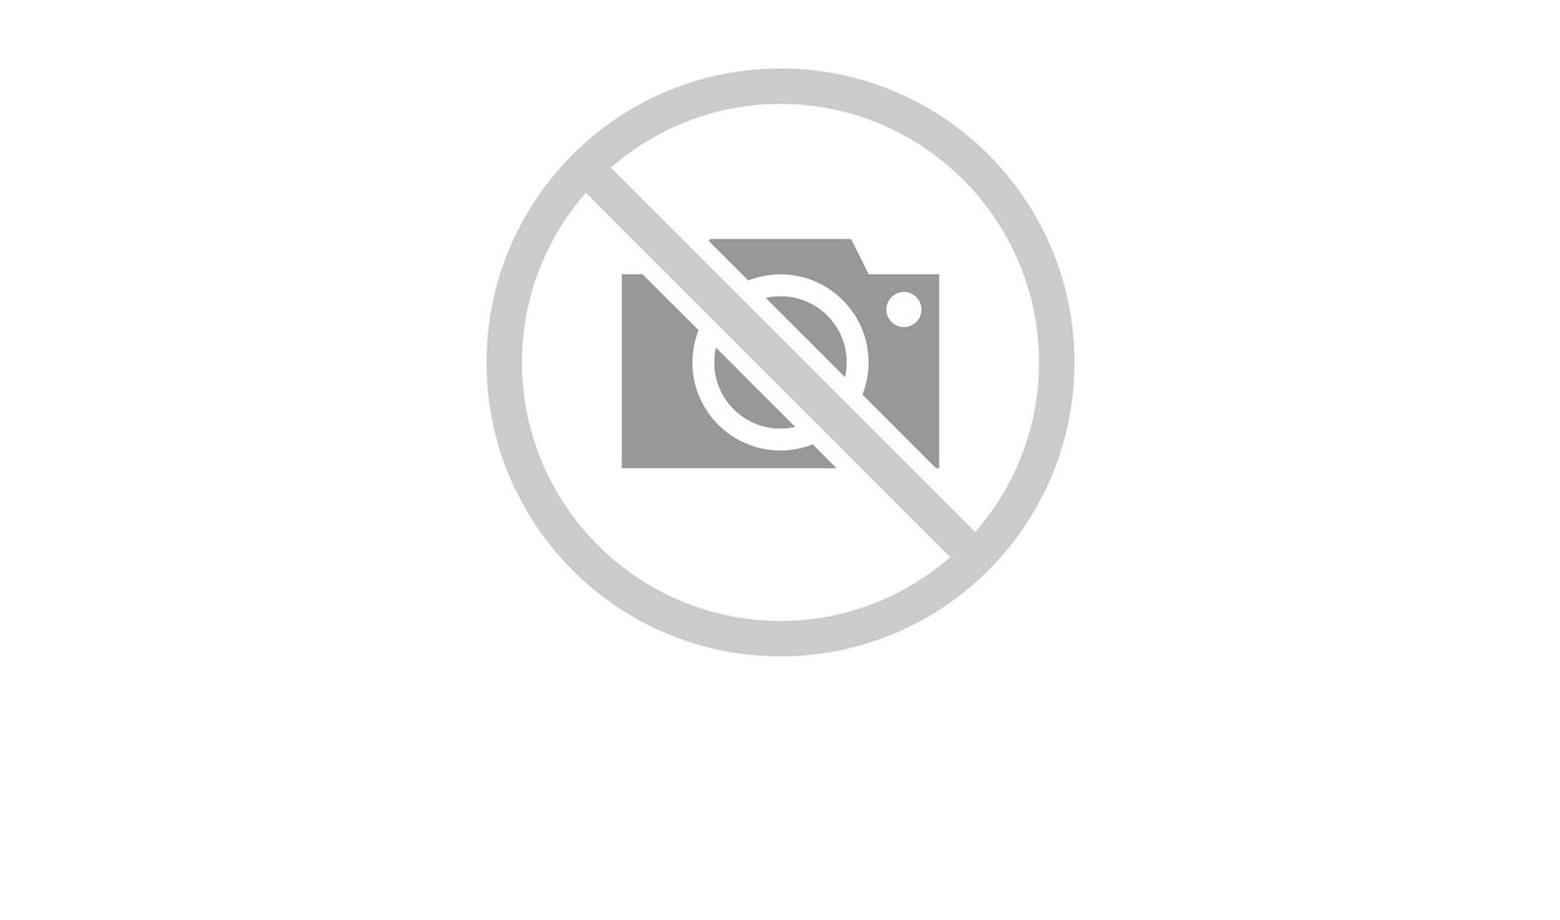 BASLIK+AYAKUCU HIPERIA PLUS 150x200 GRI (M0018)